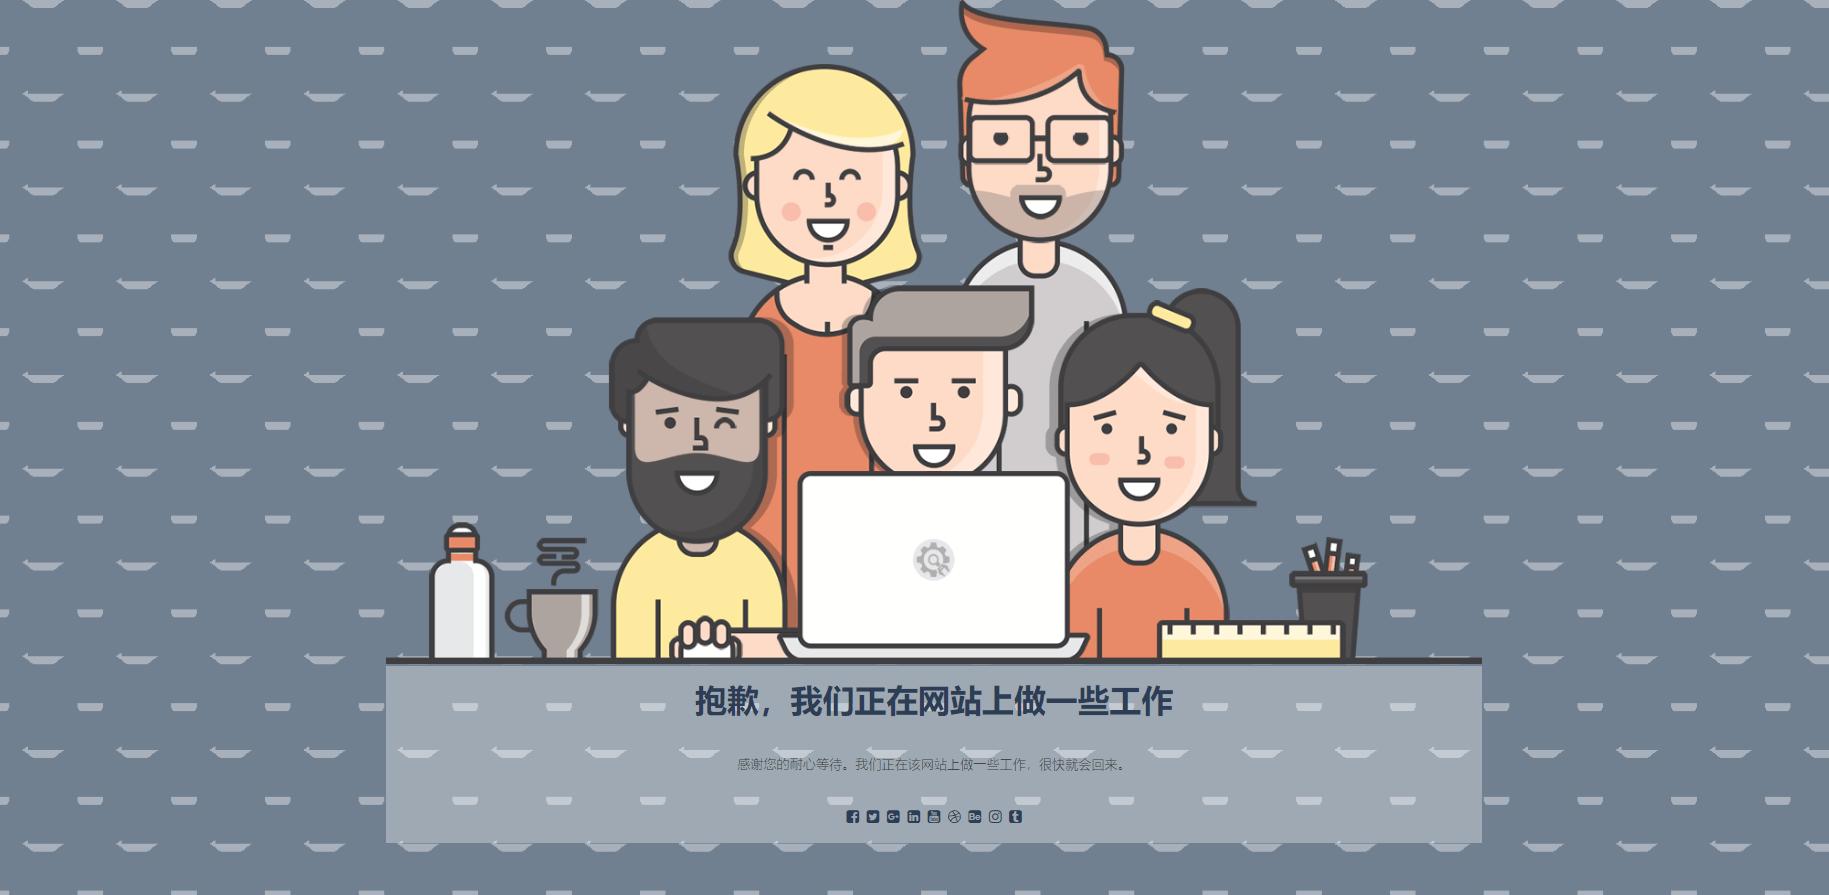 WordPress网站建设期间通知访客和搜索引擎建设